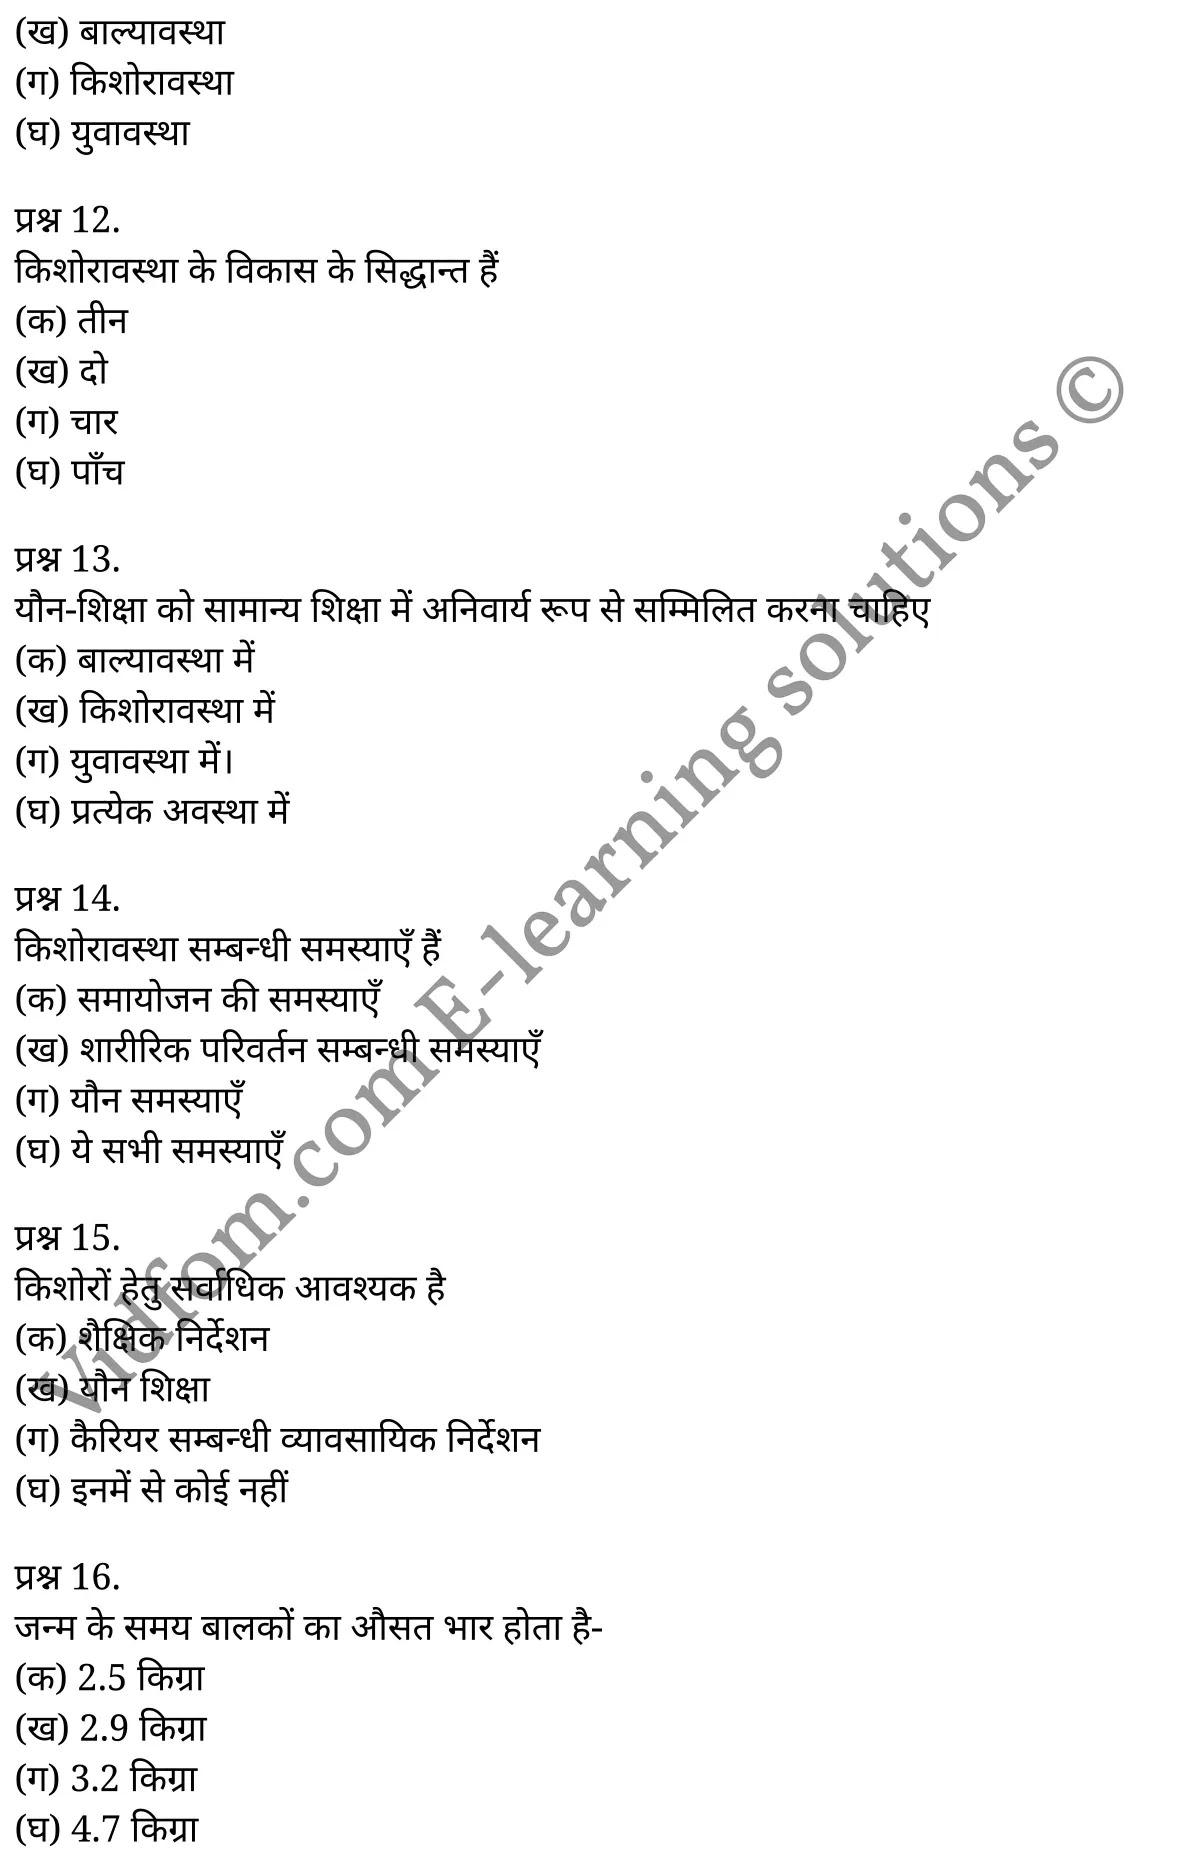 कक्षा 11 शिक्षाशास्त्र के नोट्स हिंदी में एनसीईआरटी समाधान, class 11 Pedagogy chapter 18, class 11 Pedagogy chapter 18 ncert solutions in Pedagogy, class 11 Pedagogy chapter 18 notes in hindi, class 11 Pedagogy chapter 18 question answer, class 11 Pedagogy chapter 18 notes, class 11 Pedagogy chapter 18 class 11 Pedagogy chapter 18 in hindi, class 11 Pedagogy chapter 18 important questions in hindi, class 11 Pedagogy hindi chapter 18 notes in hindi, class 11 Pedagogy chapter 18 test, class 11 Pedagogy chapter 18 class 11 Pedagogy chapter 18 pdf, class 11 Pedagogy chapter 18 notes pdf, class 11 Pedagogy chapter 18 exercise solutions, class 11 Pedagogy chapter 18, class 11 Pedagogy chapter 18 notes study rankers, class 11 Pedagogy chapter 18 notes, class 11 Pedagogy hindi chapter 18 notes, class 11 Pedagogy chapter 18 class 11 notes pdf, class 11 Pedagogy chapter 18 class 11 notes ncert, class 11 Pedagogy chapter 18 class 11 pdf, class 11 Pedagogy chapter 18 book, class 11 Pedagogy chapter 18 quiz class 11 , 11 th class 11 Pedagogy chapter 18 book up board, up board 11 th class 11 Pedagogy chapter 18 notes, class 11 Pedagogy, class 11 Pedagogy ncert solutions in Pedagogy, class 11 Pedagogy notes in hindi, class 11 Pedagogy question answer, class 11 Pedagogy notes, class 11 Pedagogy class 11 Pedagogy chapter 18 in hindi, class 11 Pedagogy important questions in hindi, class 11 Pedagogy notes in hindi, class 11 Pedagogy test, class 11 Pedagogy class 11 Pedagogy chapter 18 pdf, class 11 Pedagogy notes pdf, class 11 Pedagogy exercise solutions, class 11 Pedagogy, class 11 Pedagogy notes study rankers, class 11 Pedagogy notes, class 11 Pedagogy notes, class 11 Pedagogy class 11 notes pdf, class 11 Pedagogy class 11 notes ncert, class 11 Pedagogy class 11 pdf, class 11 Pedagogy book, class 11 Pedagogy quiz class 11 , 11 th class 11 Pedagogy book up board, up board 11 th class 11 Pedagogy notes, कक्षा 11 शिक्षाशास्त्र अध्याय 18 , कक्षा 11 शिक्षाशास्त्र, कक्षा 11 शिक्षाशास्त्र